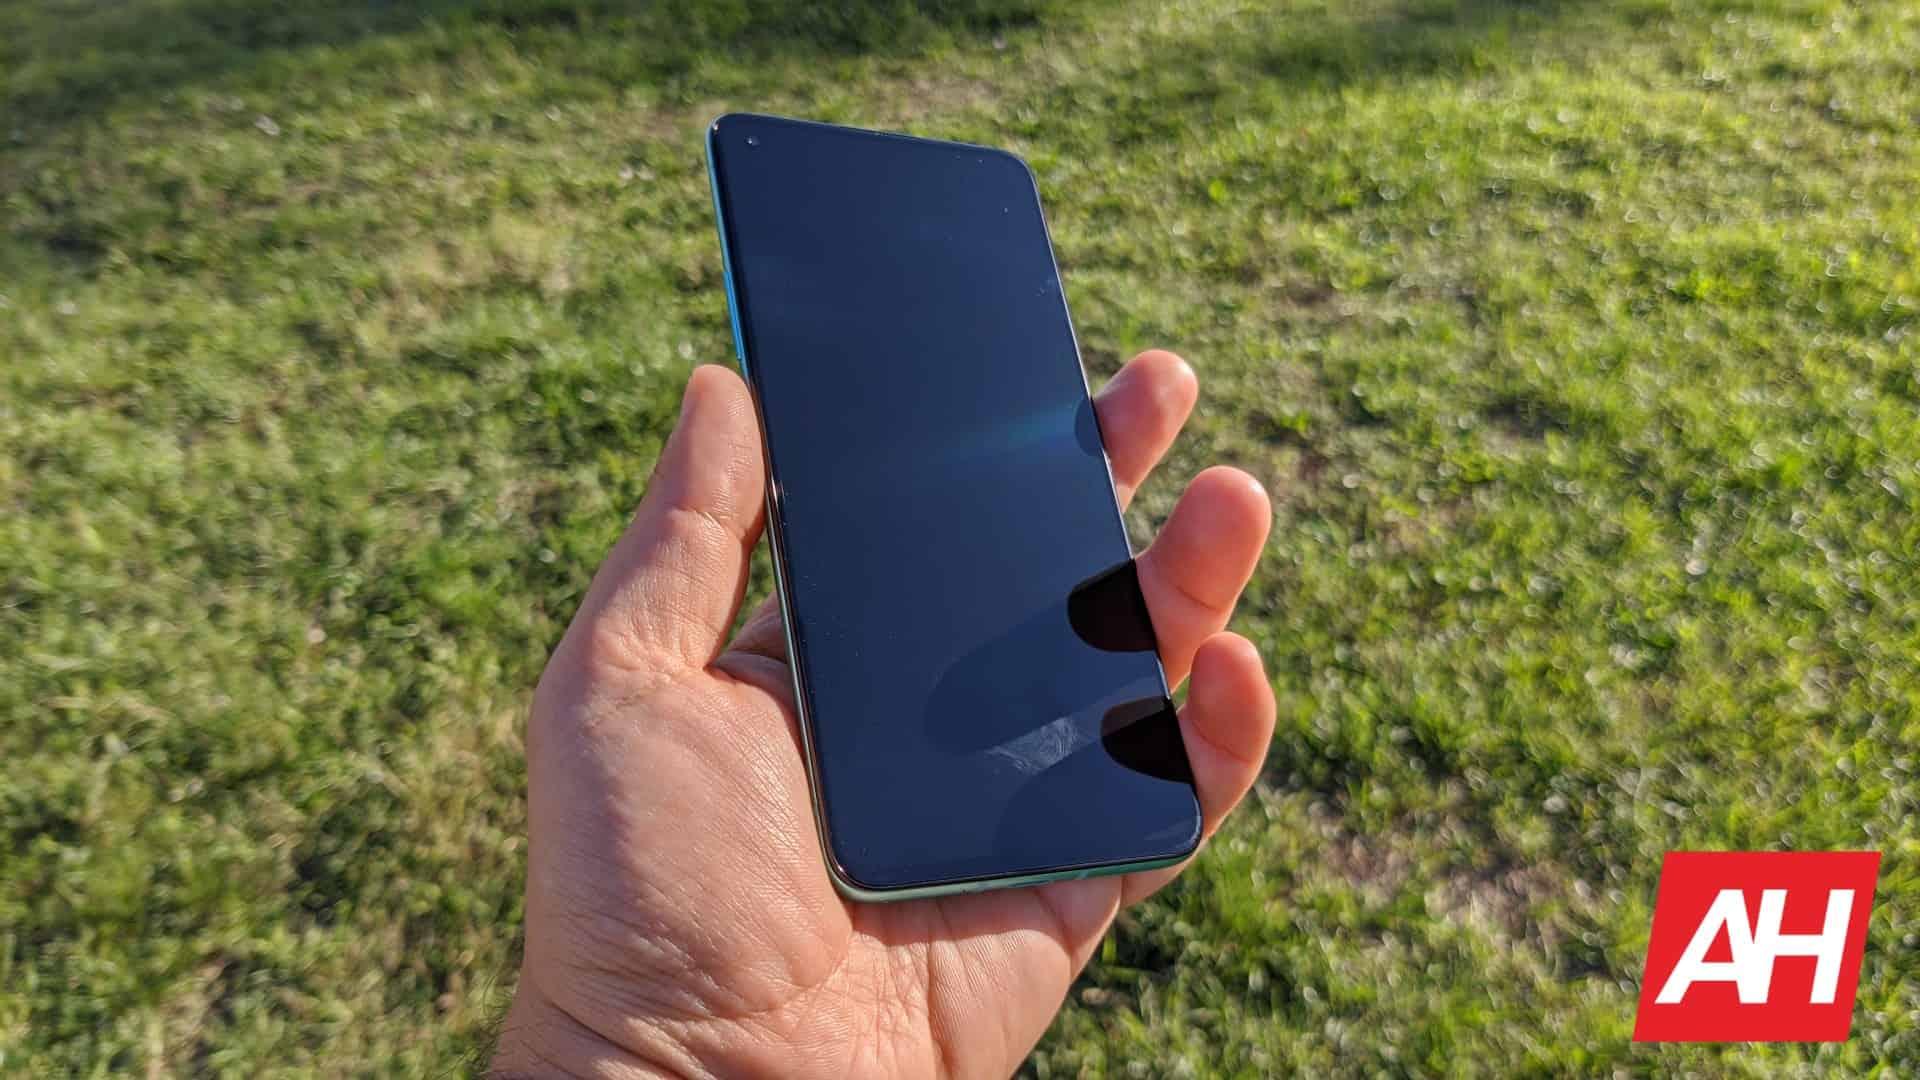 AH OnePlus 8T image 37